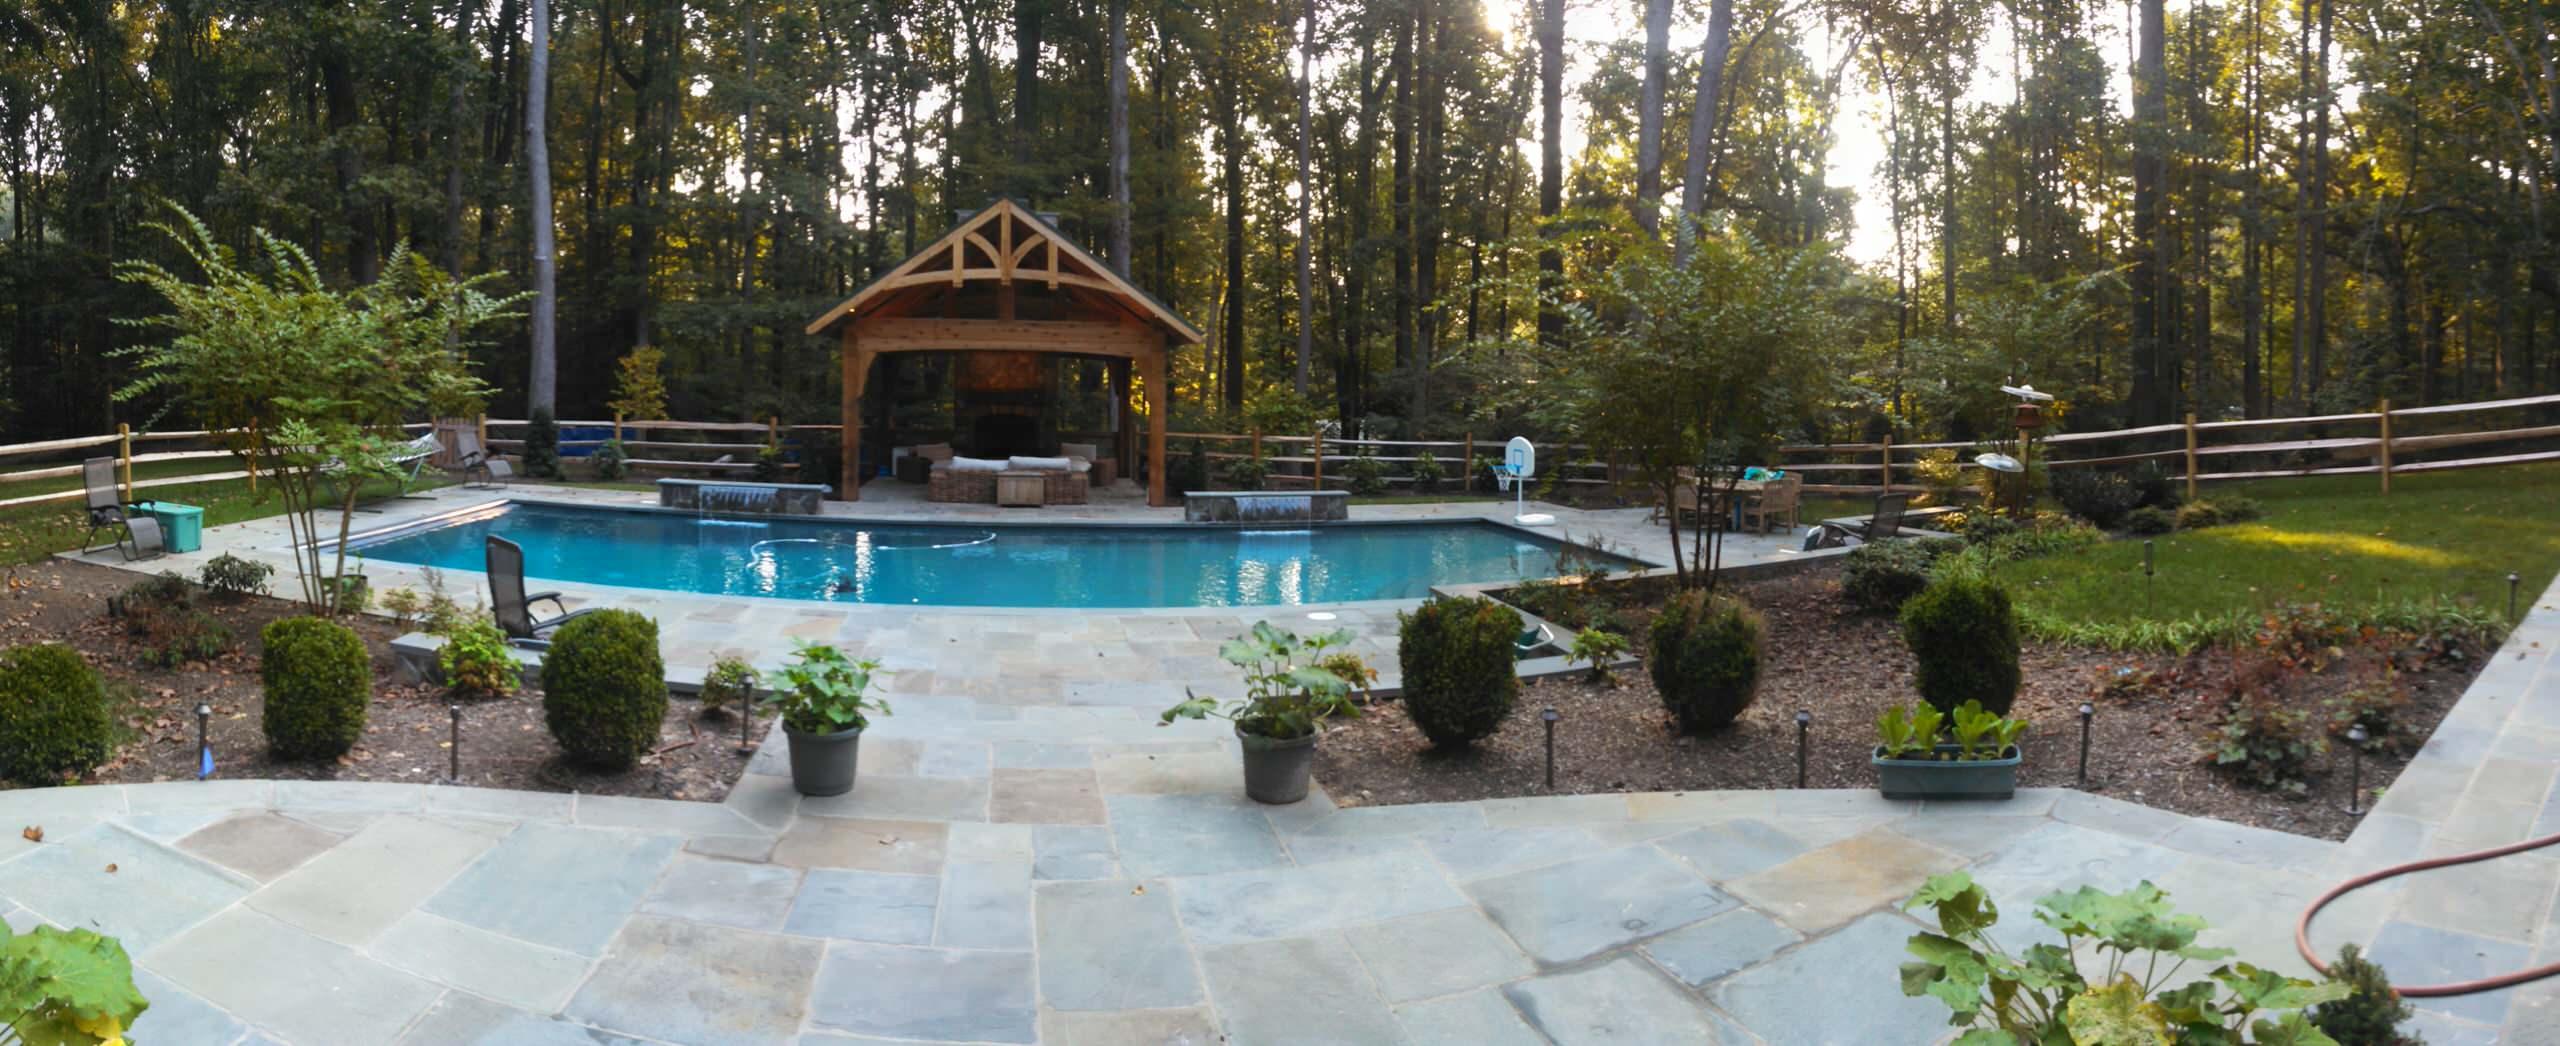 Fairfax Station Pool, Pavilion, & Fireplace